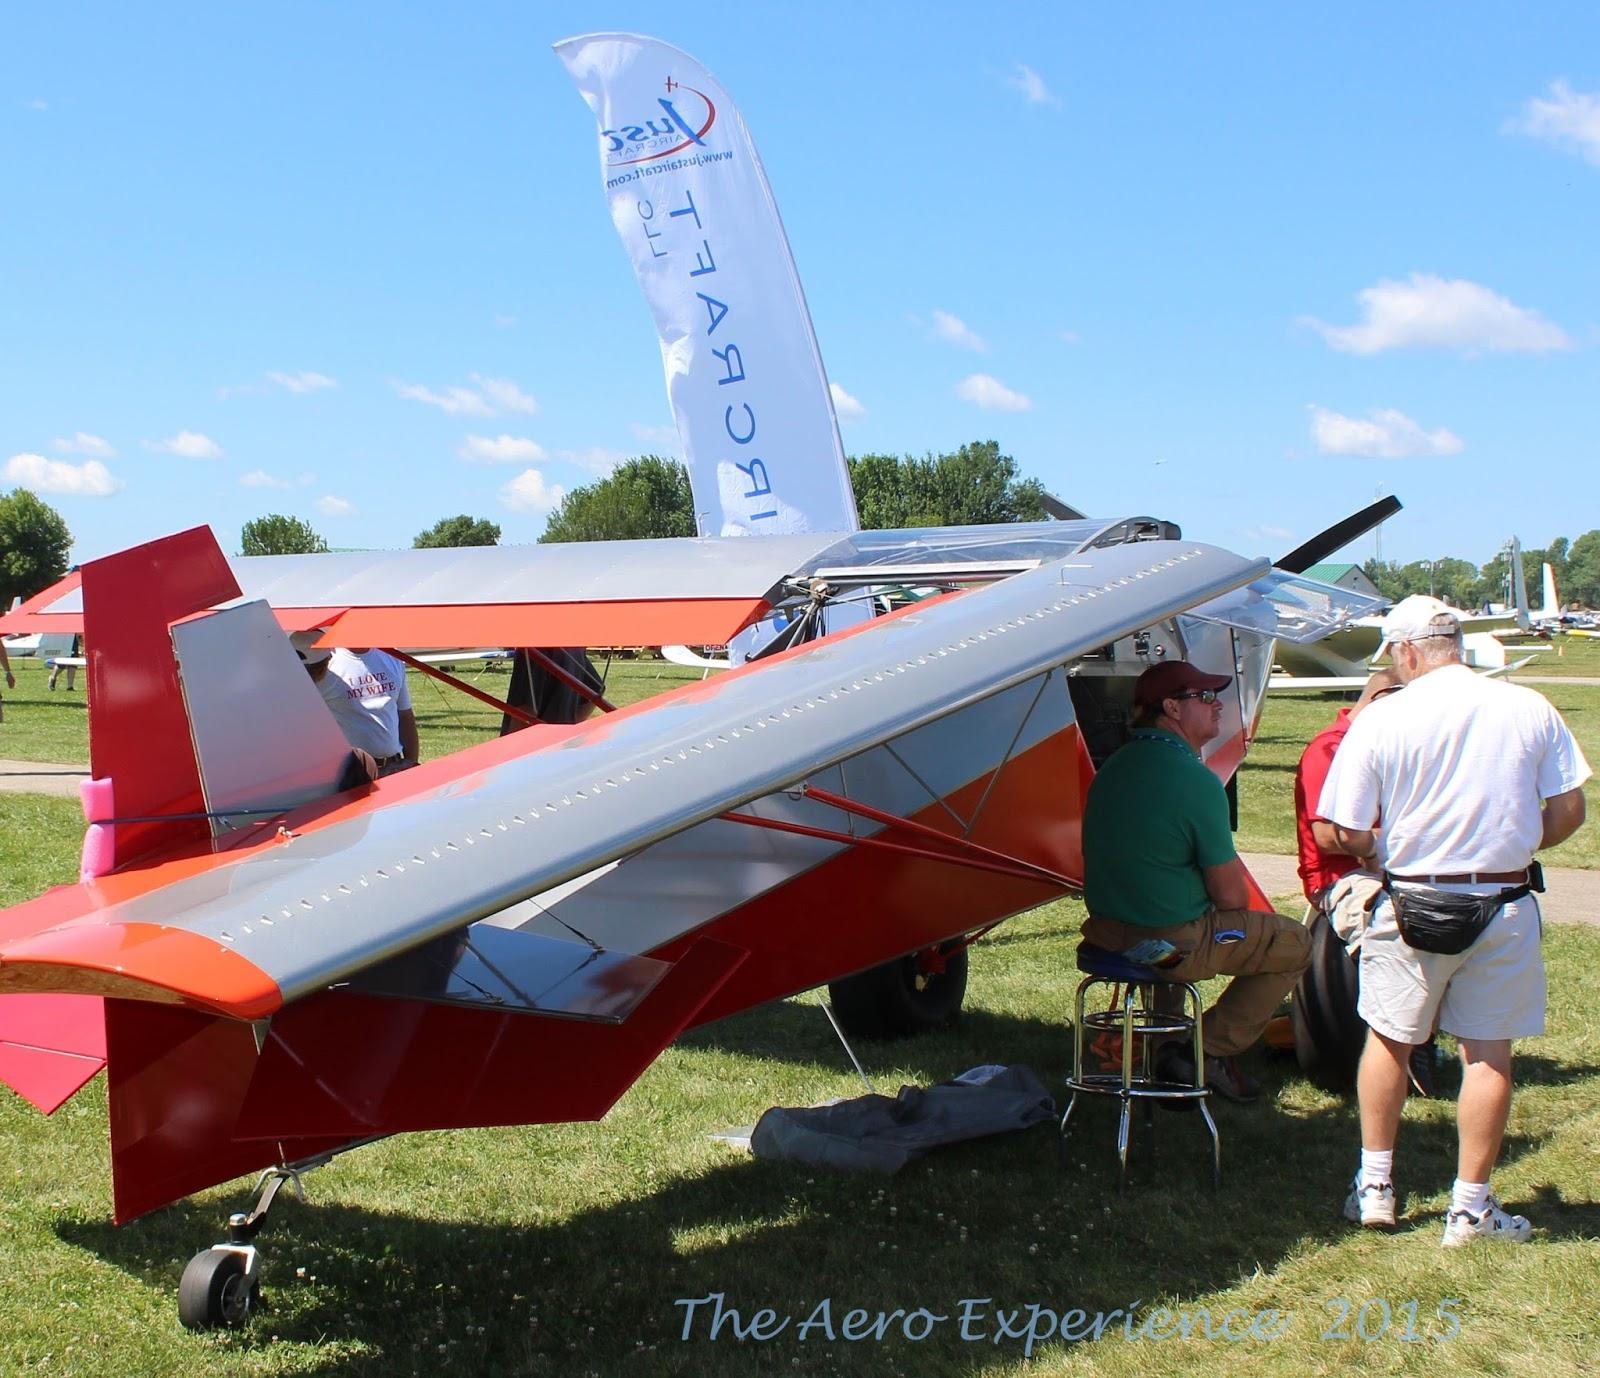 The Aero Experience: EAA AirVenture Oshkosh 2015: Exhibitors - The